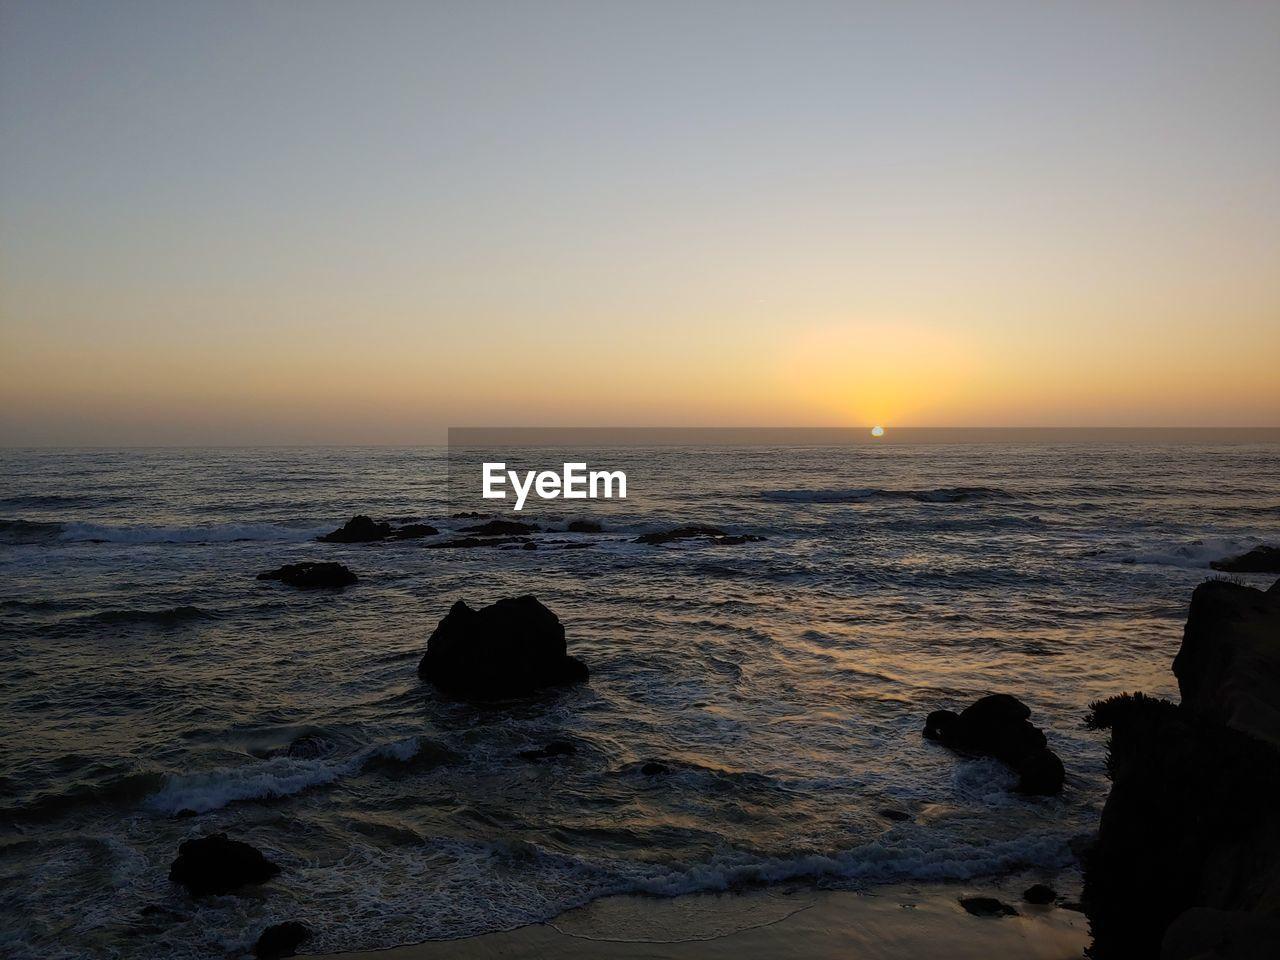 sky, sea, water, sunset, scenics - nature, beauty in nature, beach, horizon over water, rock, horizon, land, motion, wave, rock - object, solid, nature, idyllic, sun, non-urban scene, no people, outdoors